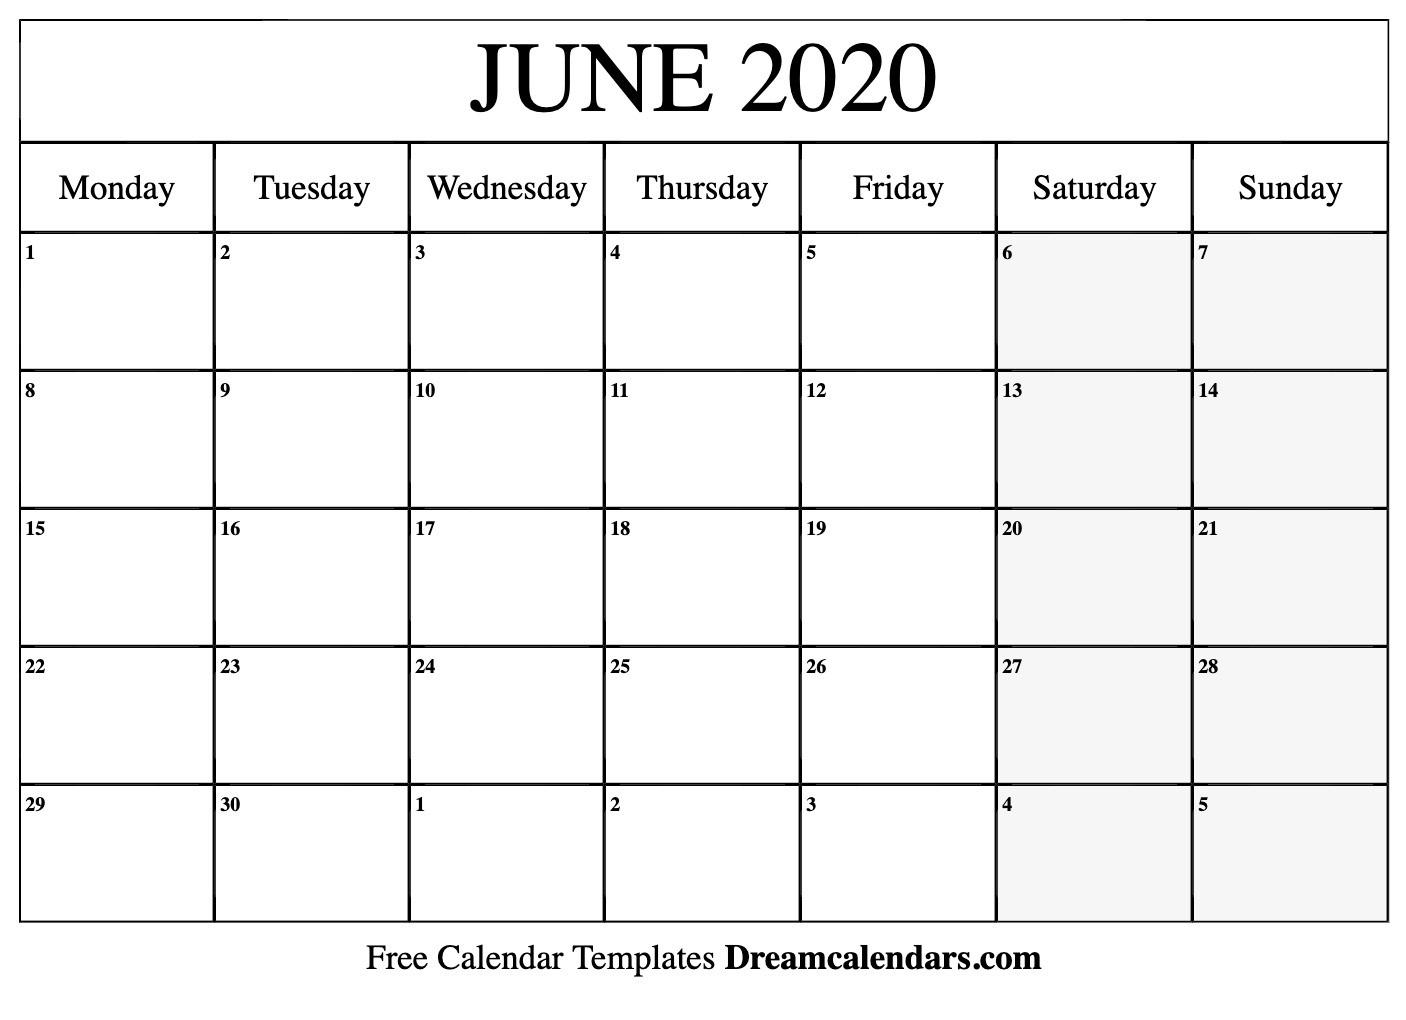 Printable June 2020 Calendar-Blank Printable Calendar 2020 June